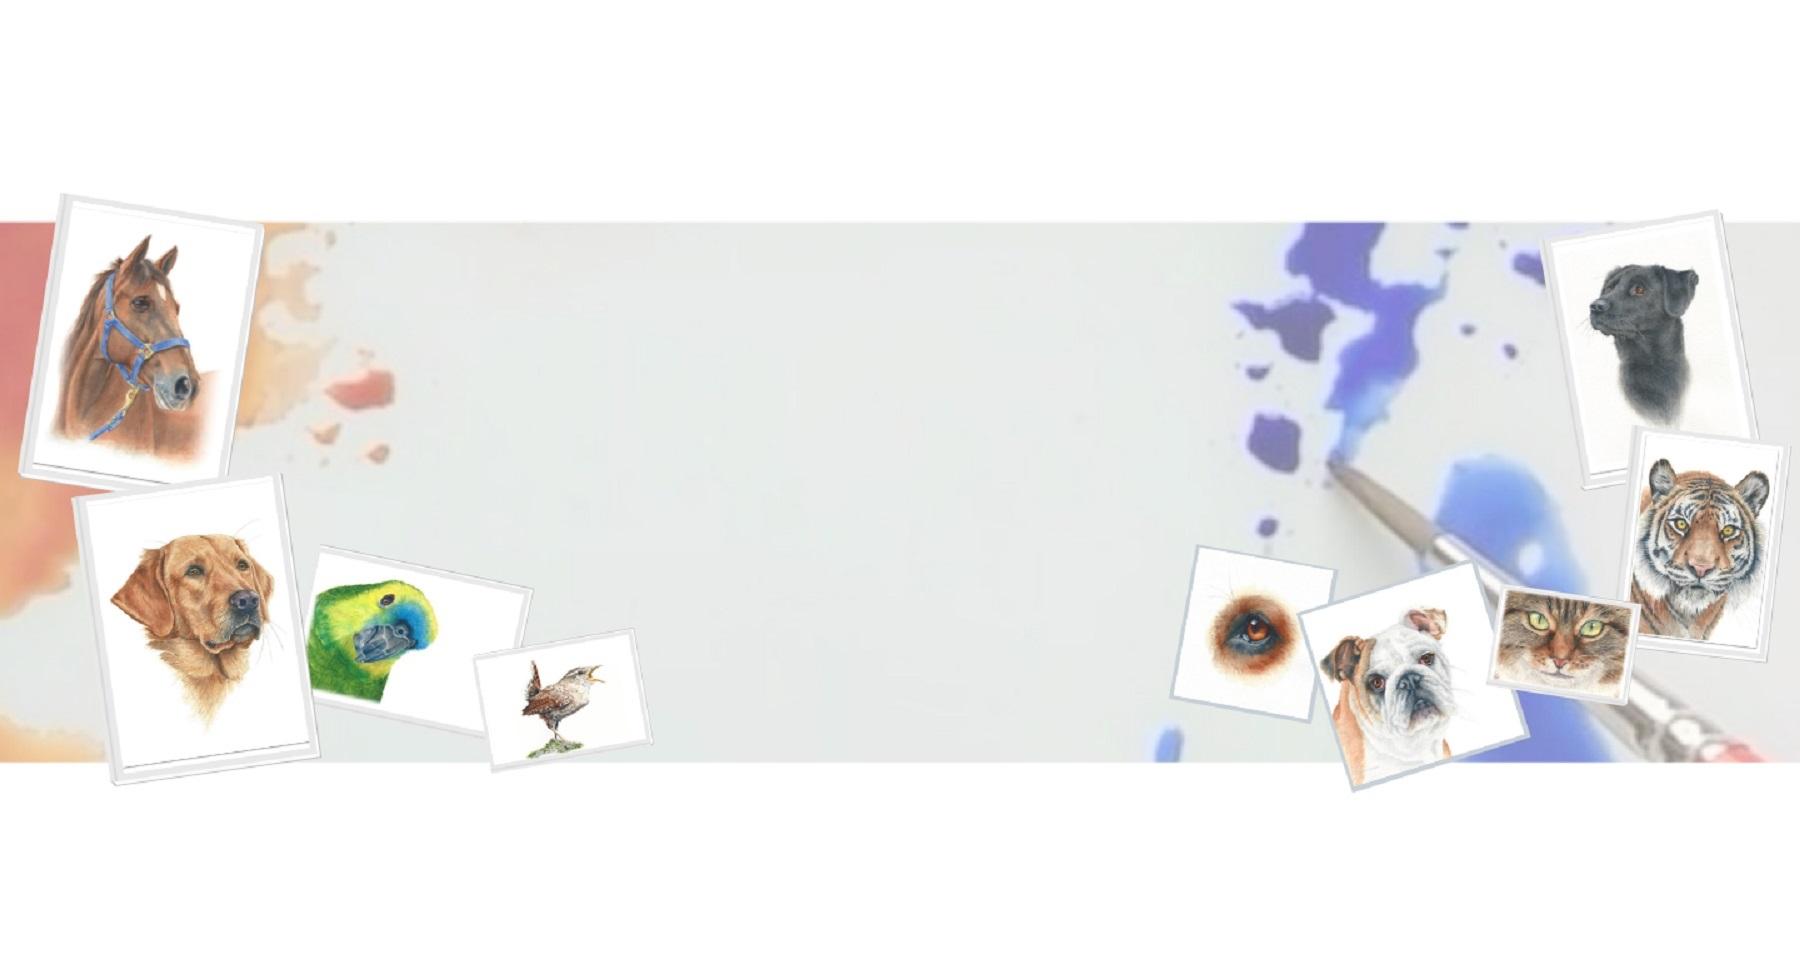 rebecca rhodes watercolors